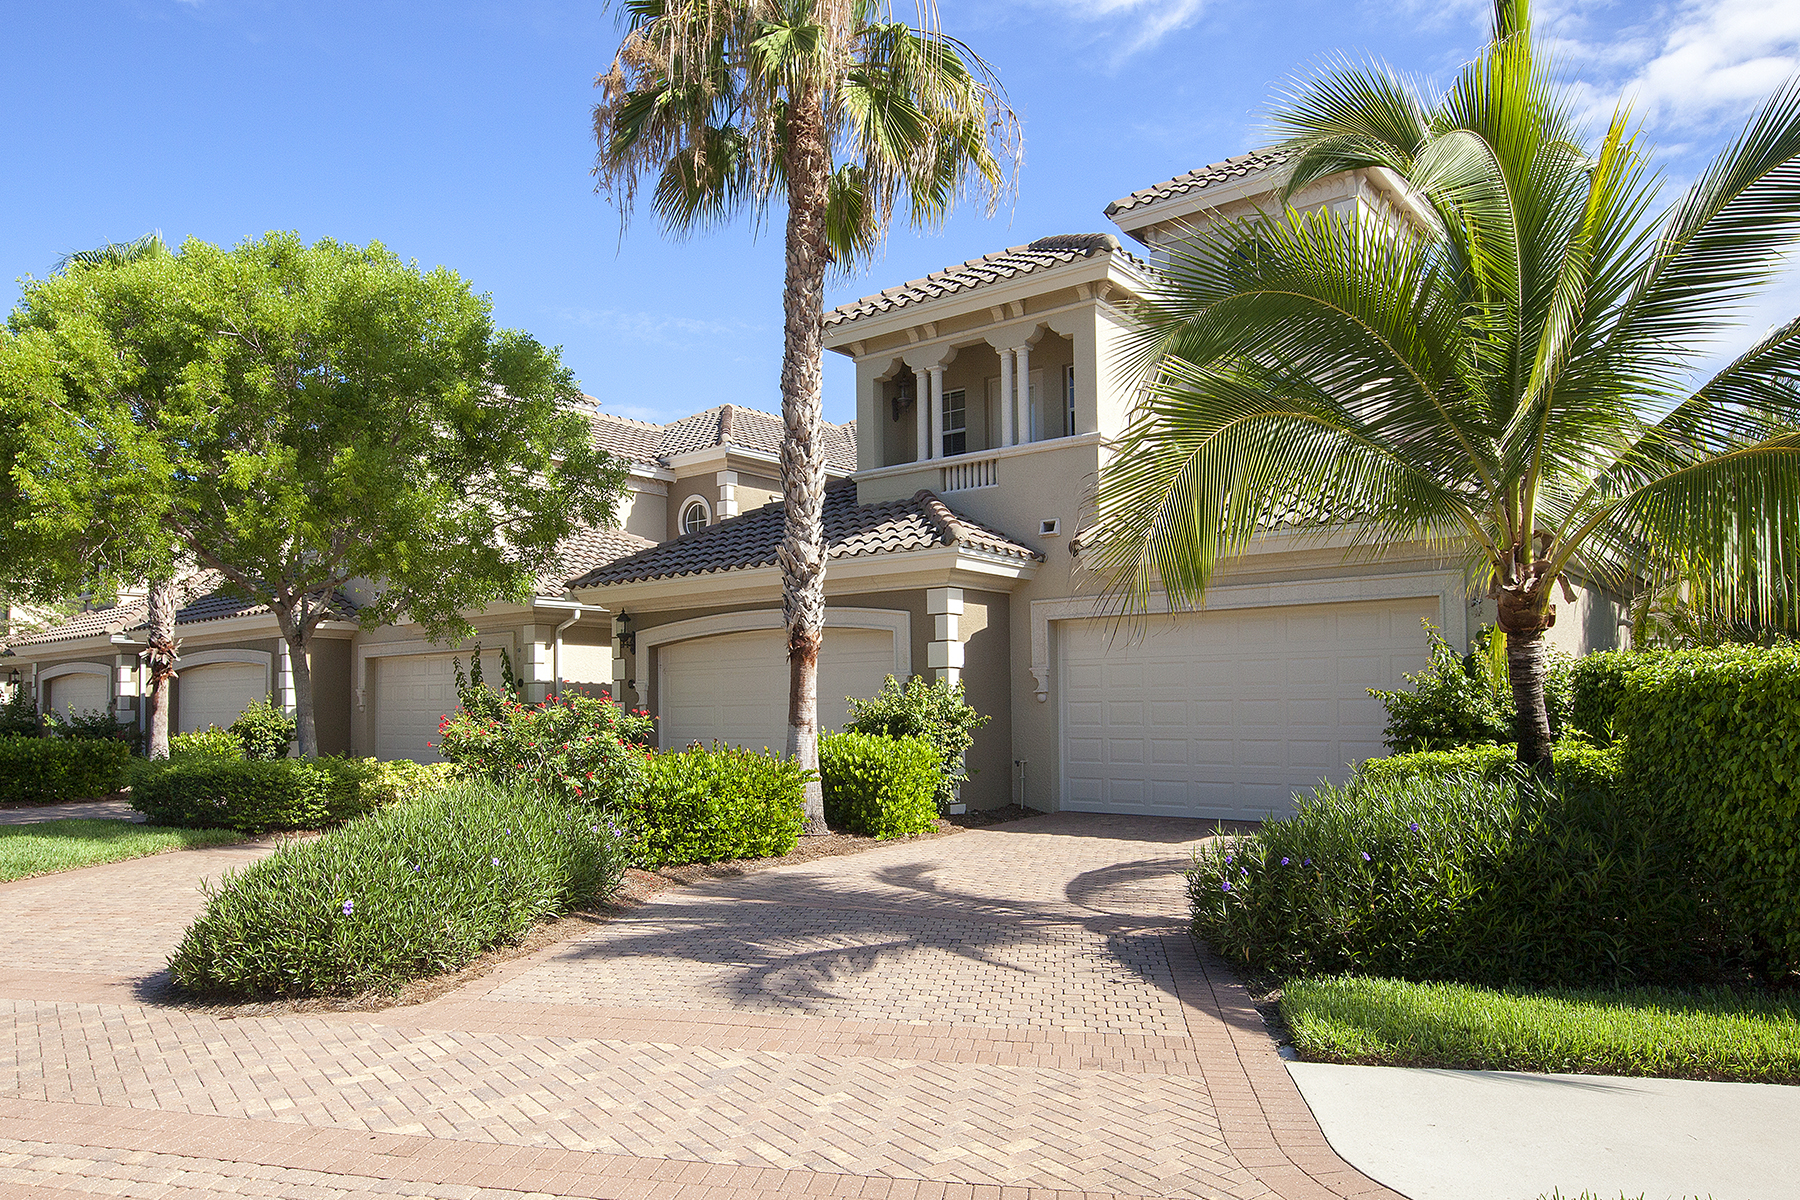 Condominium for Sale at FIDDLER'S CREEK - VARENNA 9205 Museo Cir 104 Naples, Florida 34114 United States